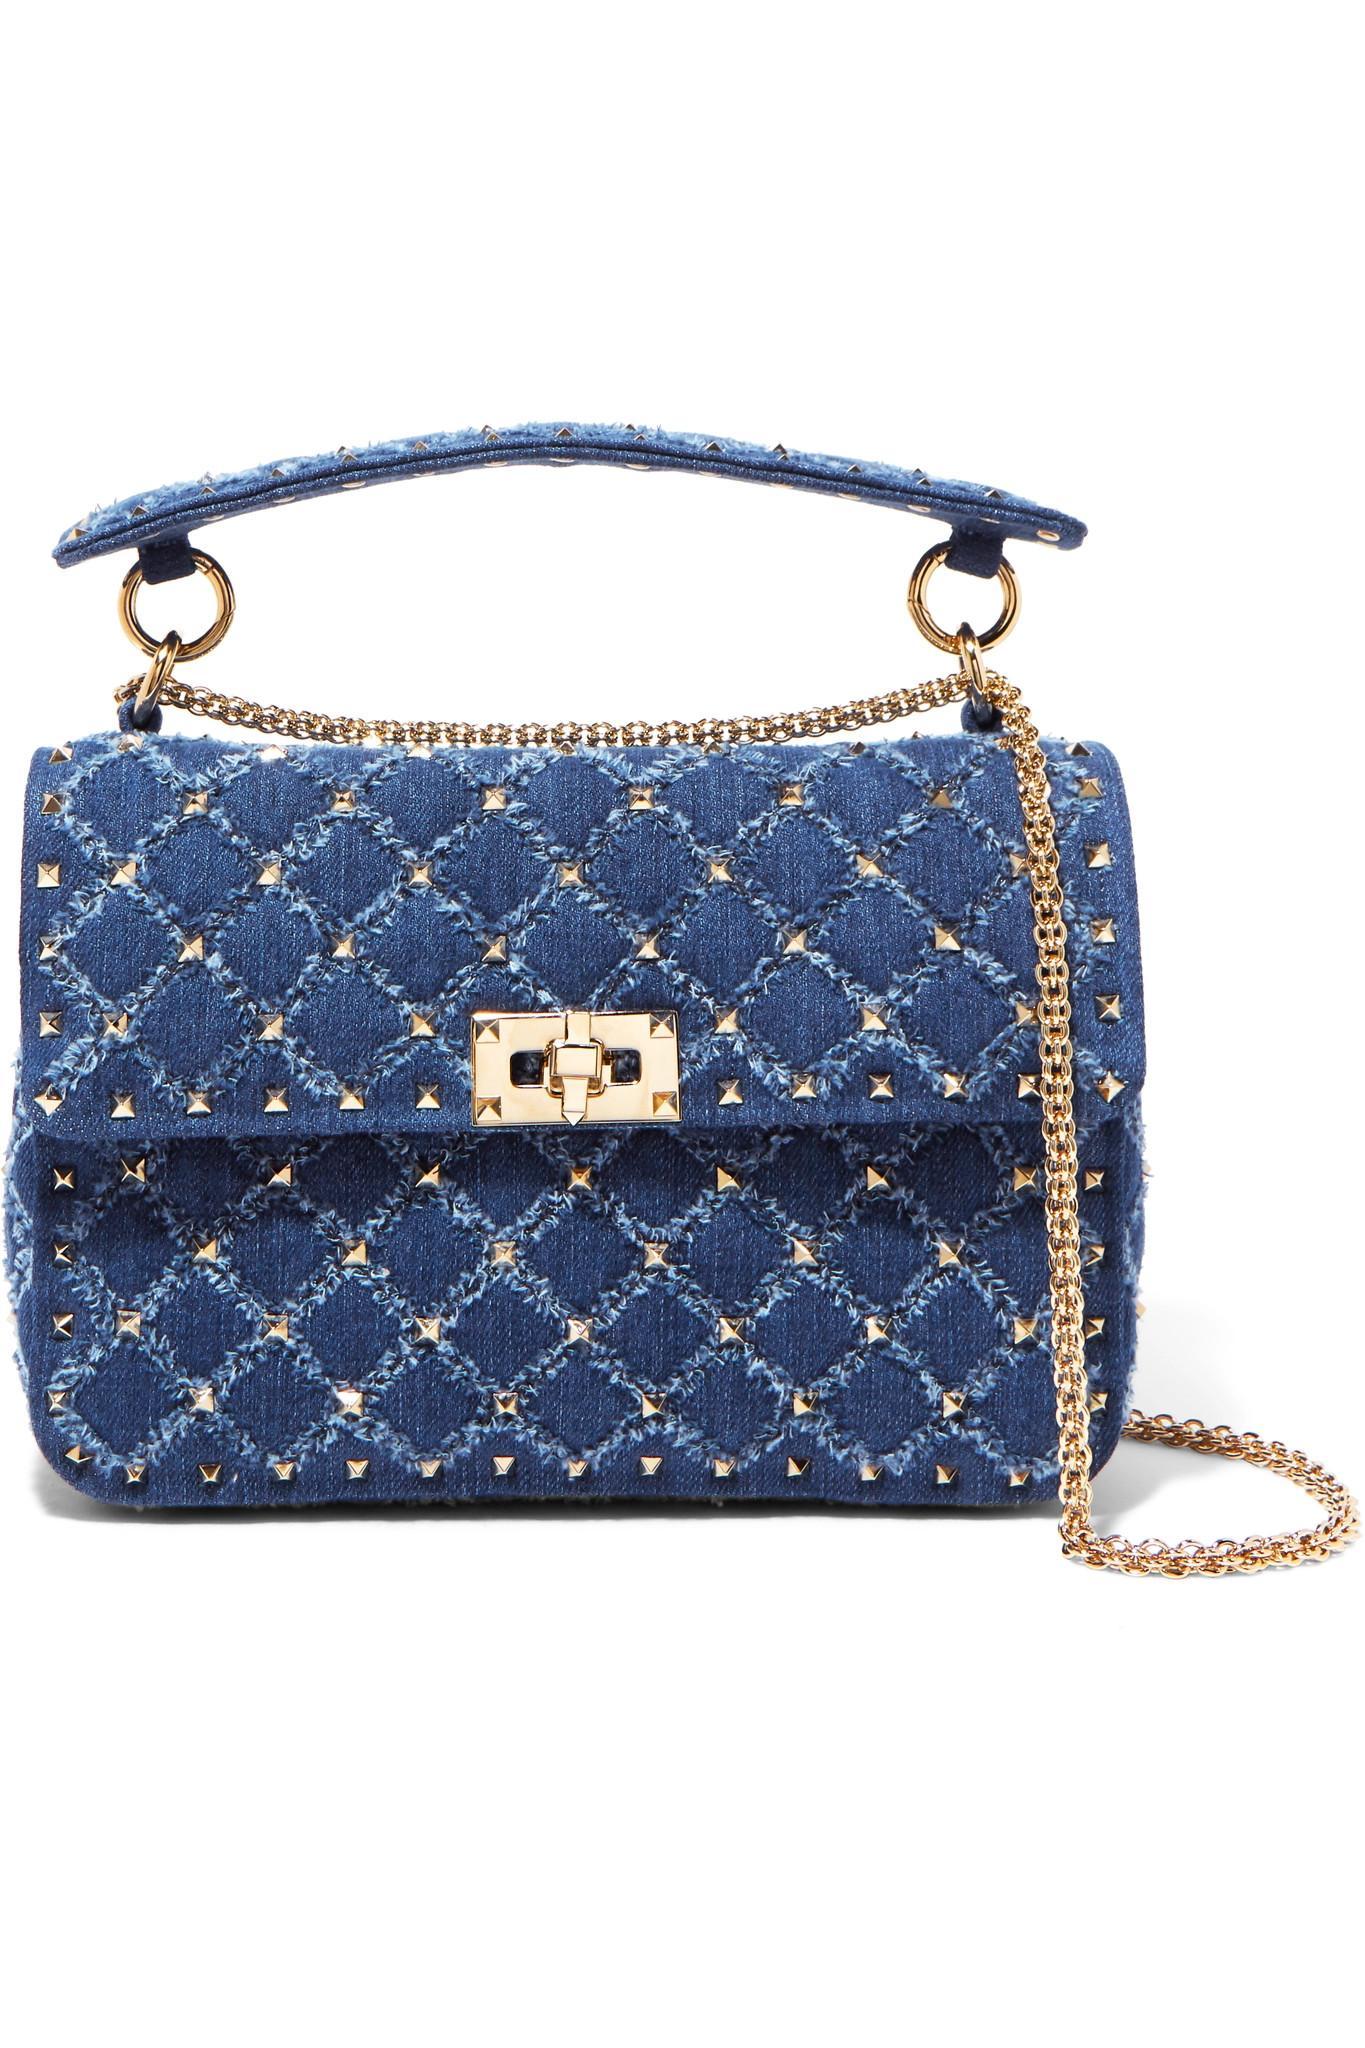 e6f05ec9e9 Valentino. Women's Blue Garavani The Rockstud Spike Medium Quilted Denim  Shoulder Bag